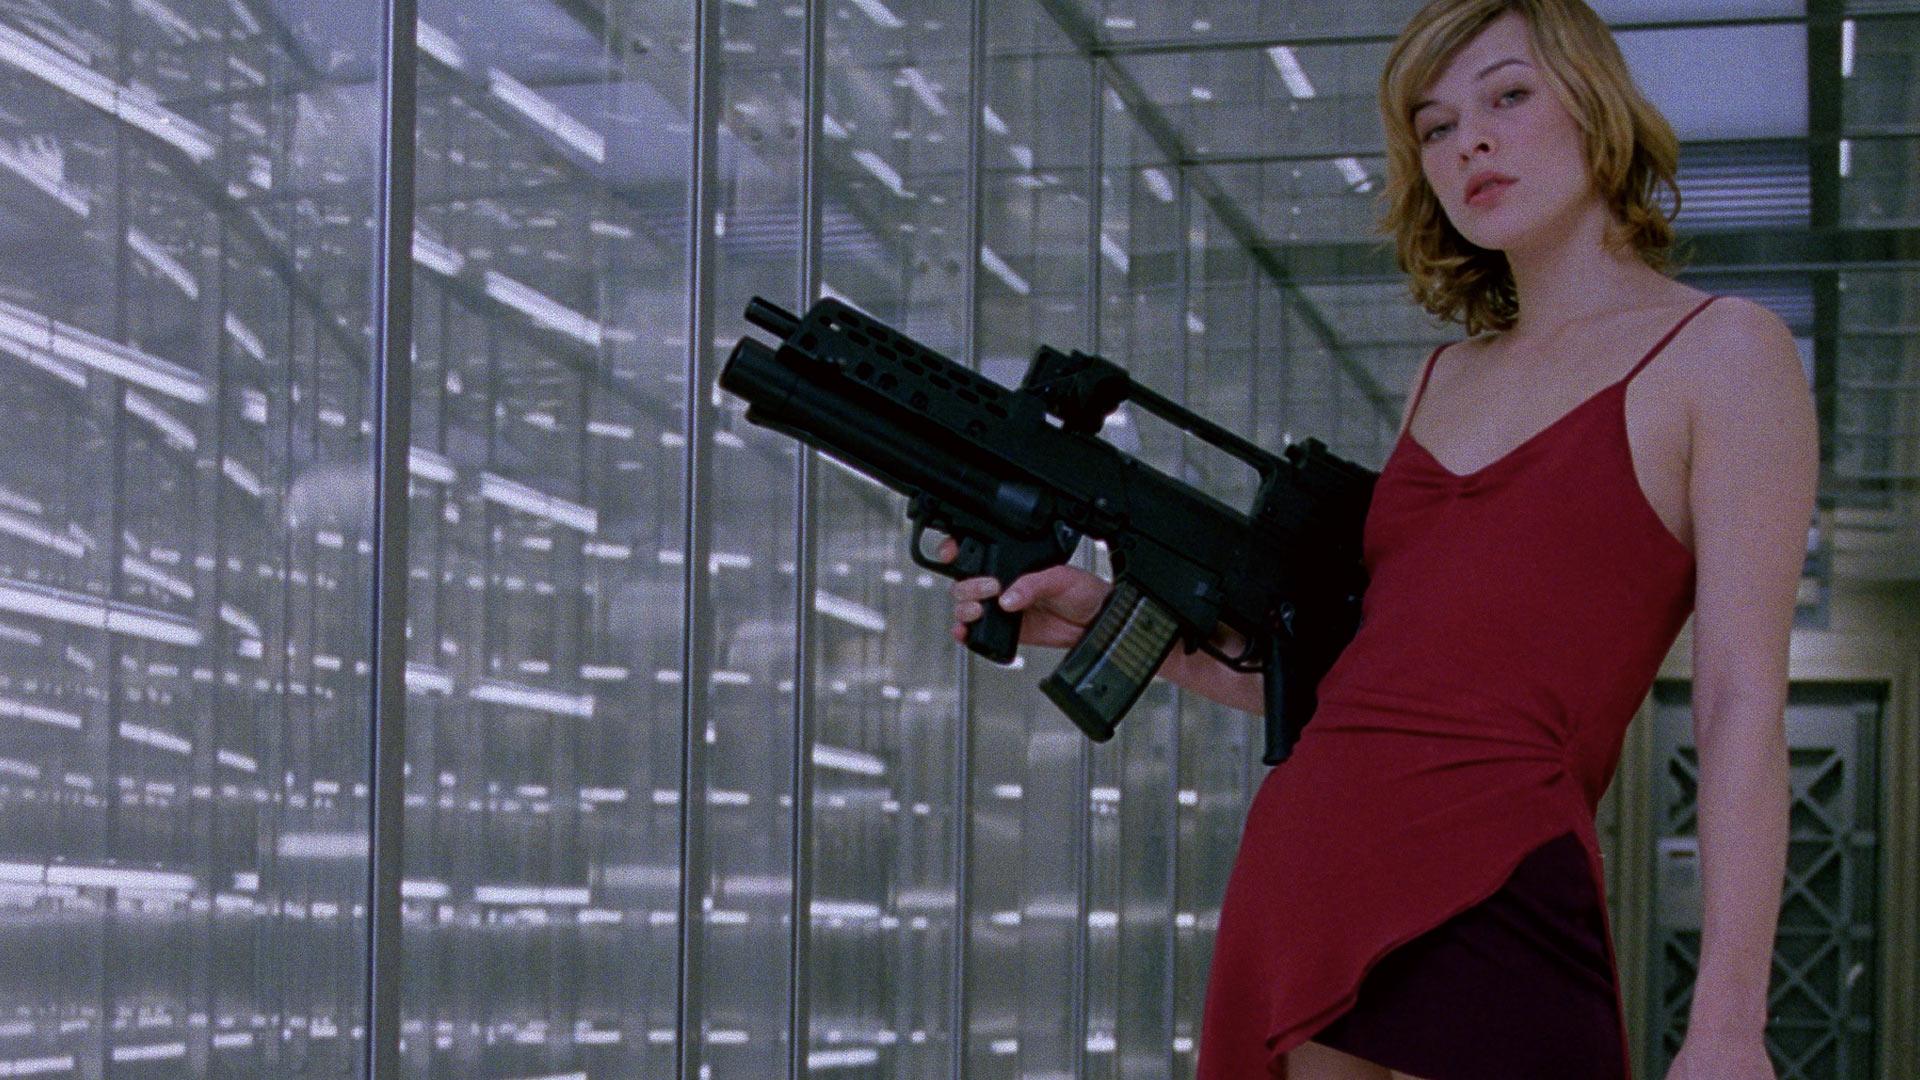 Milla Jovovich as Alice posing with a gun.